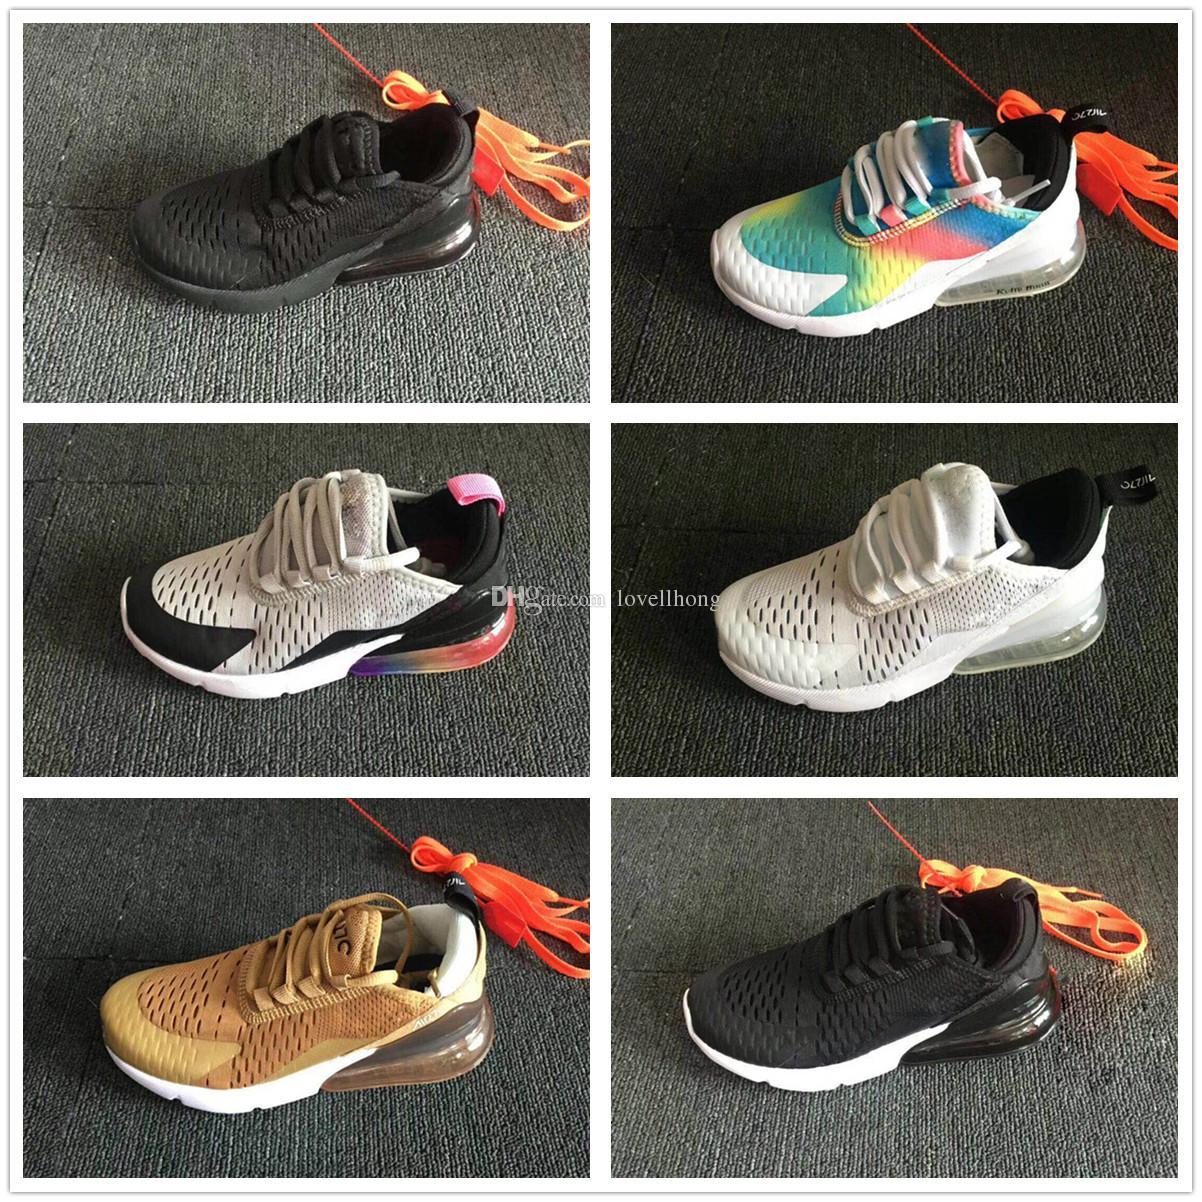 270 Chaussures Acheter 2018 Nike Airmax Nouveau Max Air Enfants wSntSxRv